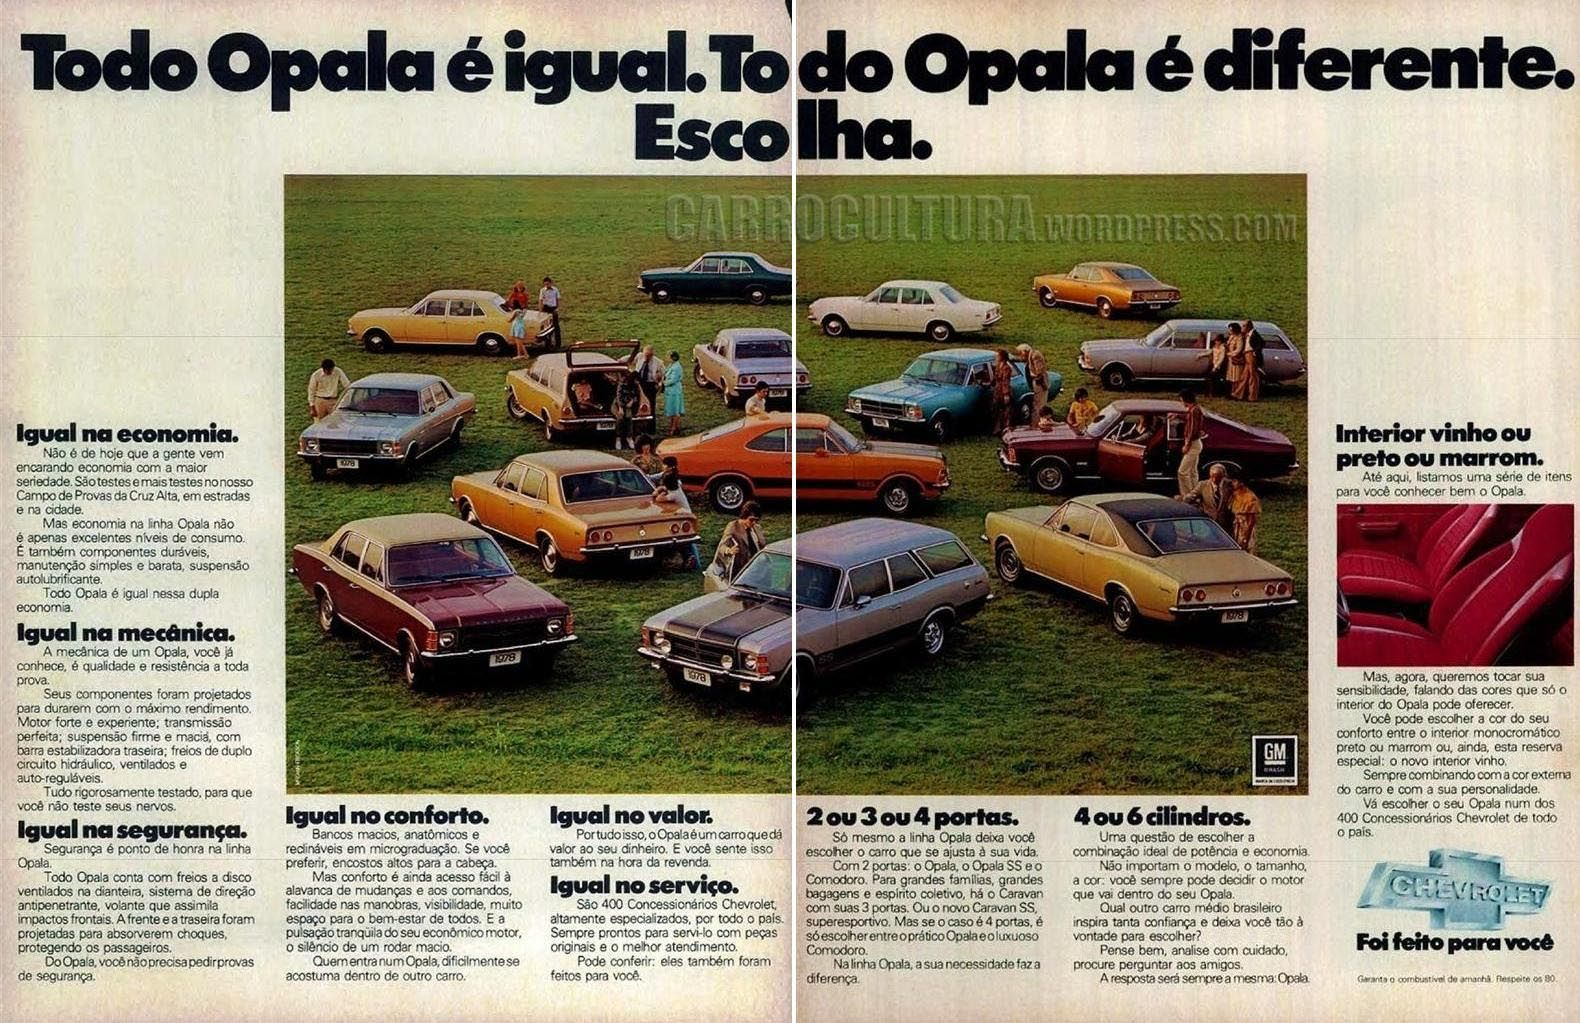 Opala Caravan Carros Caminhoes Opala